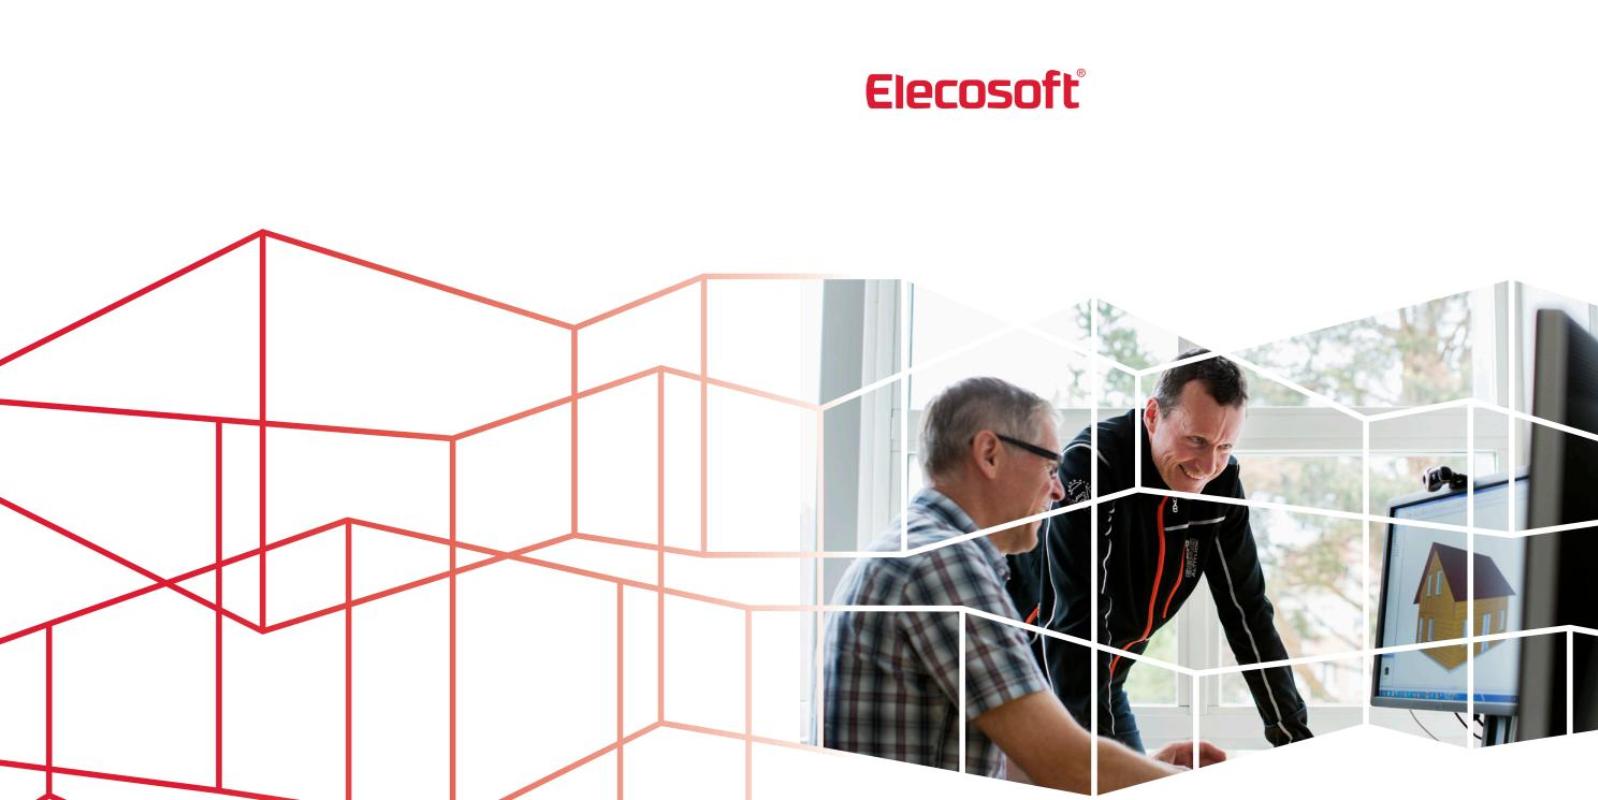 Over Elecosoft